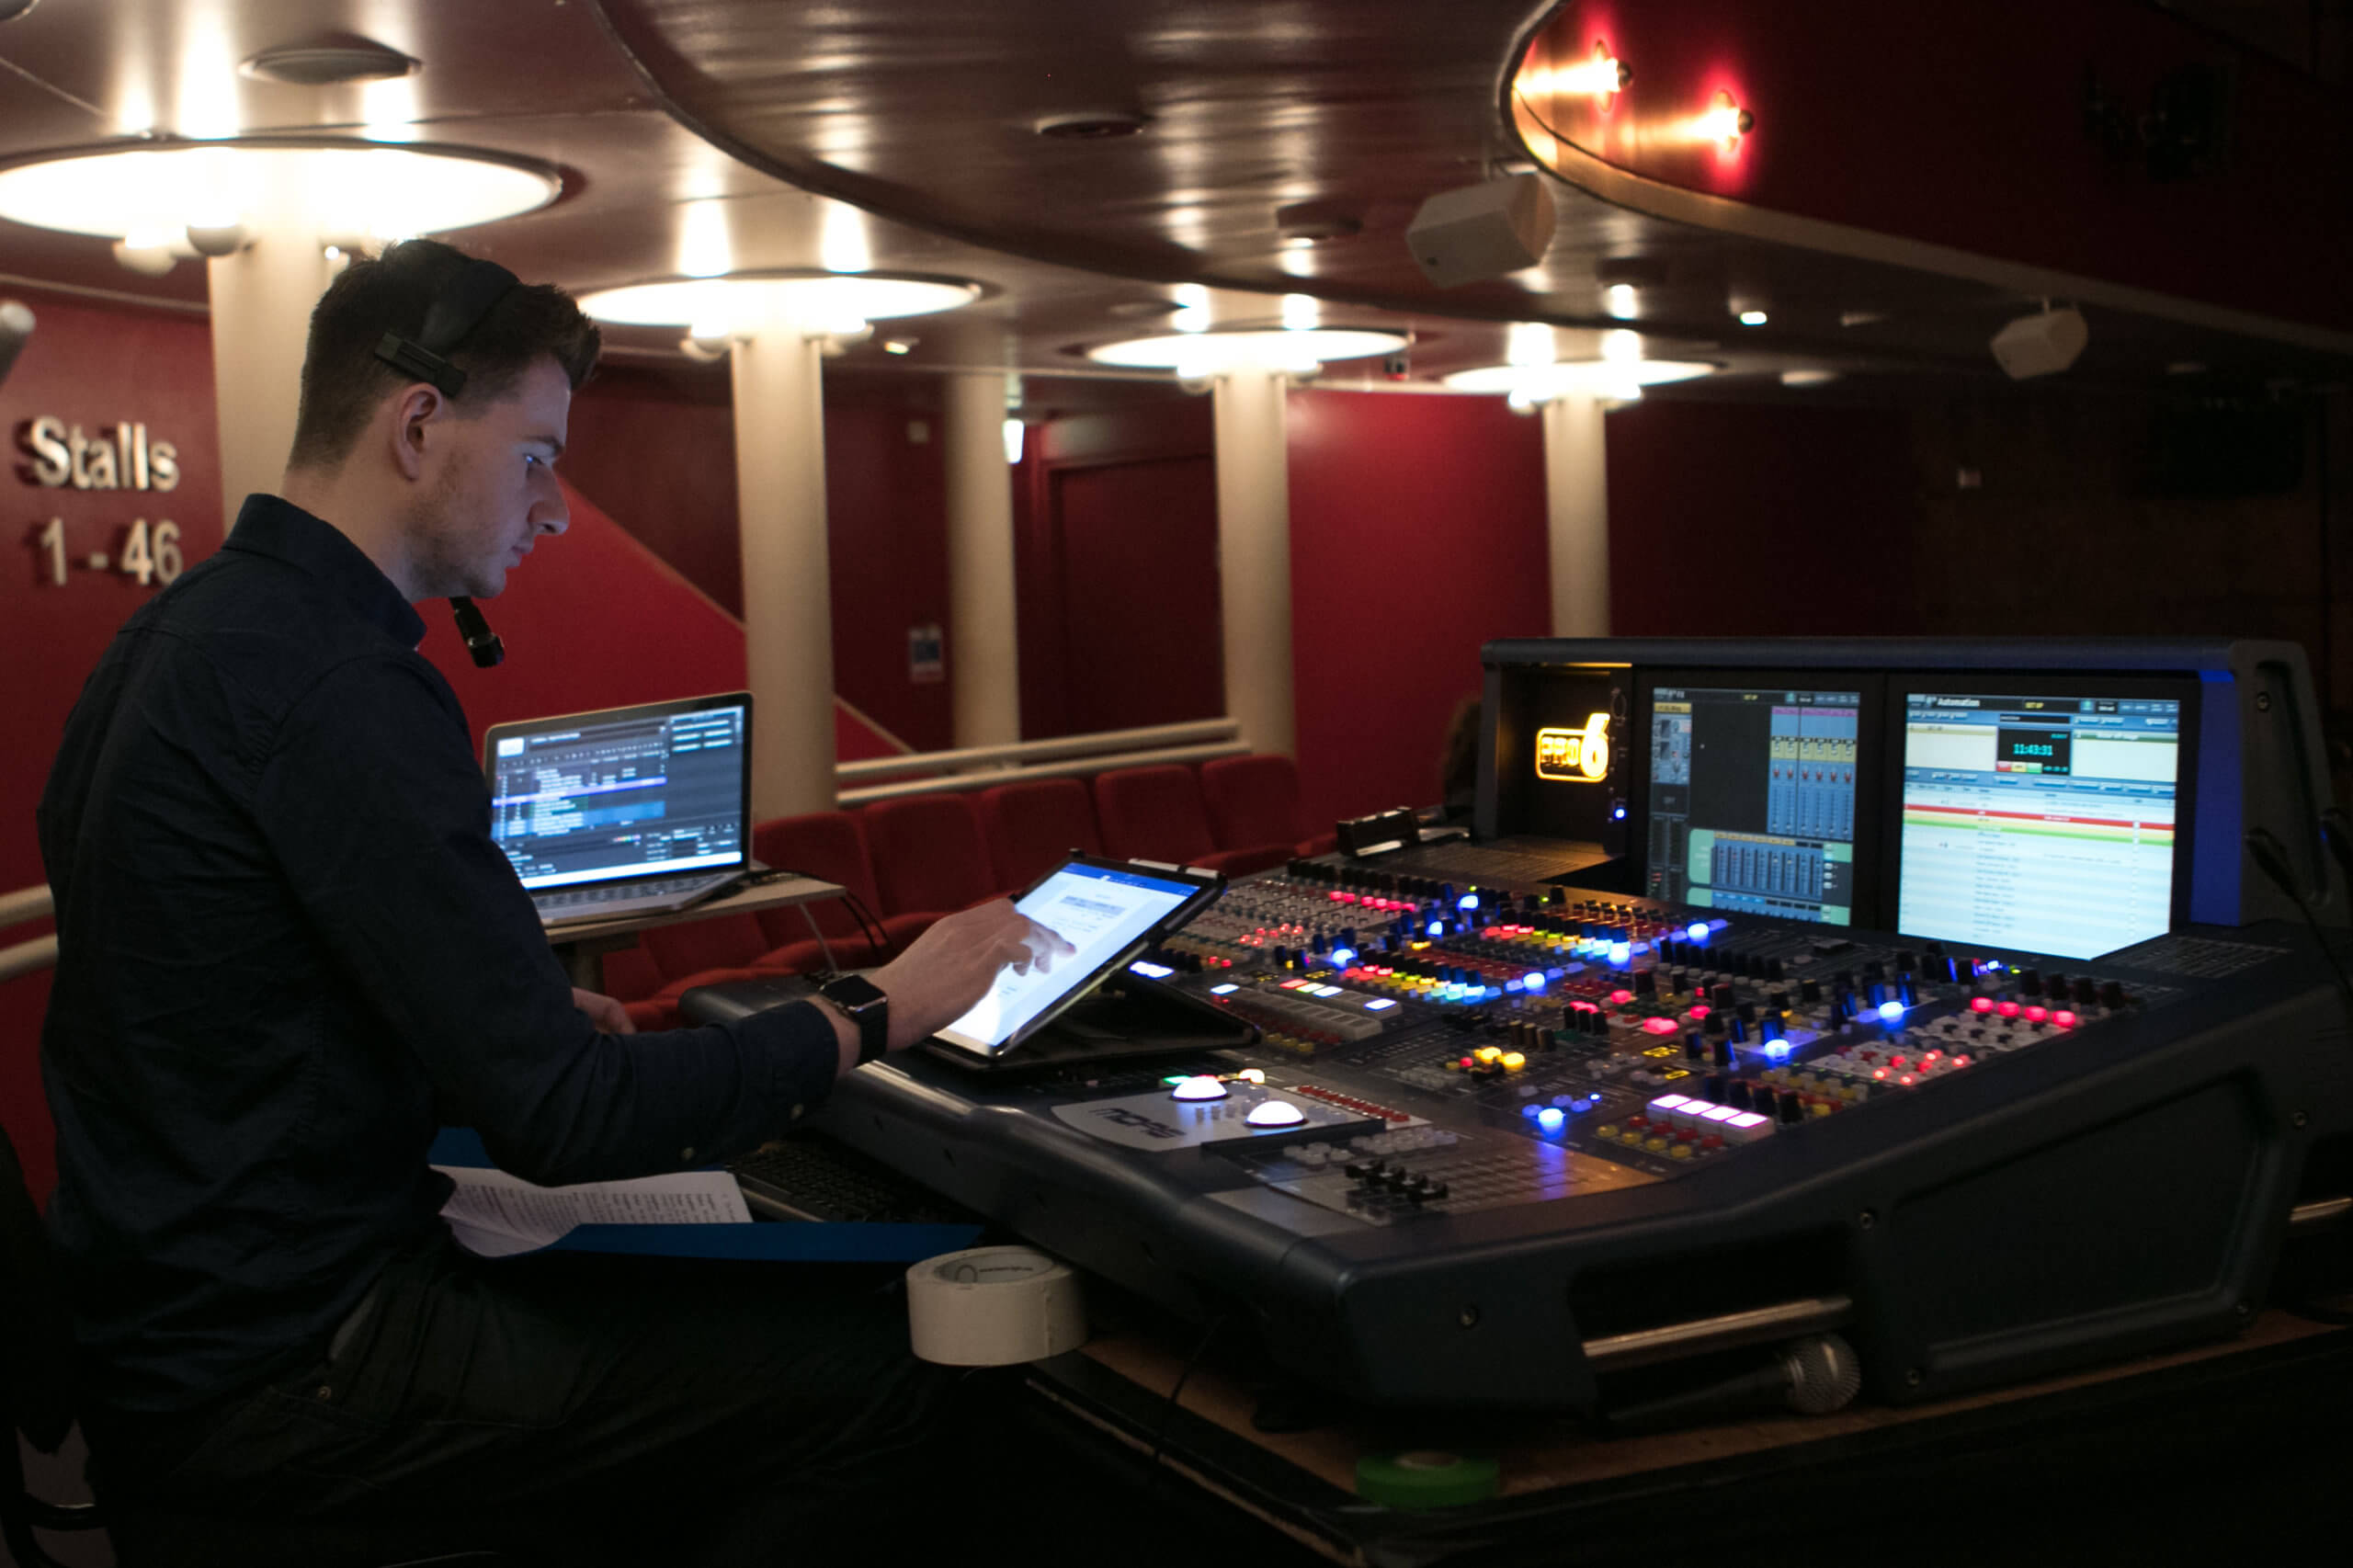 BA Production Technology and Management Image